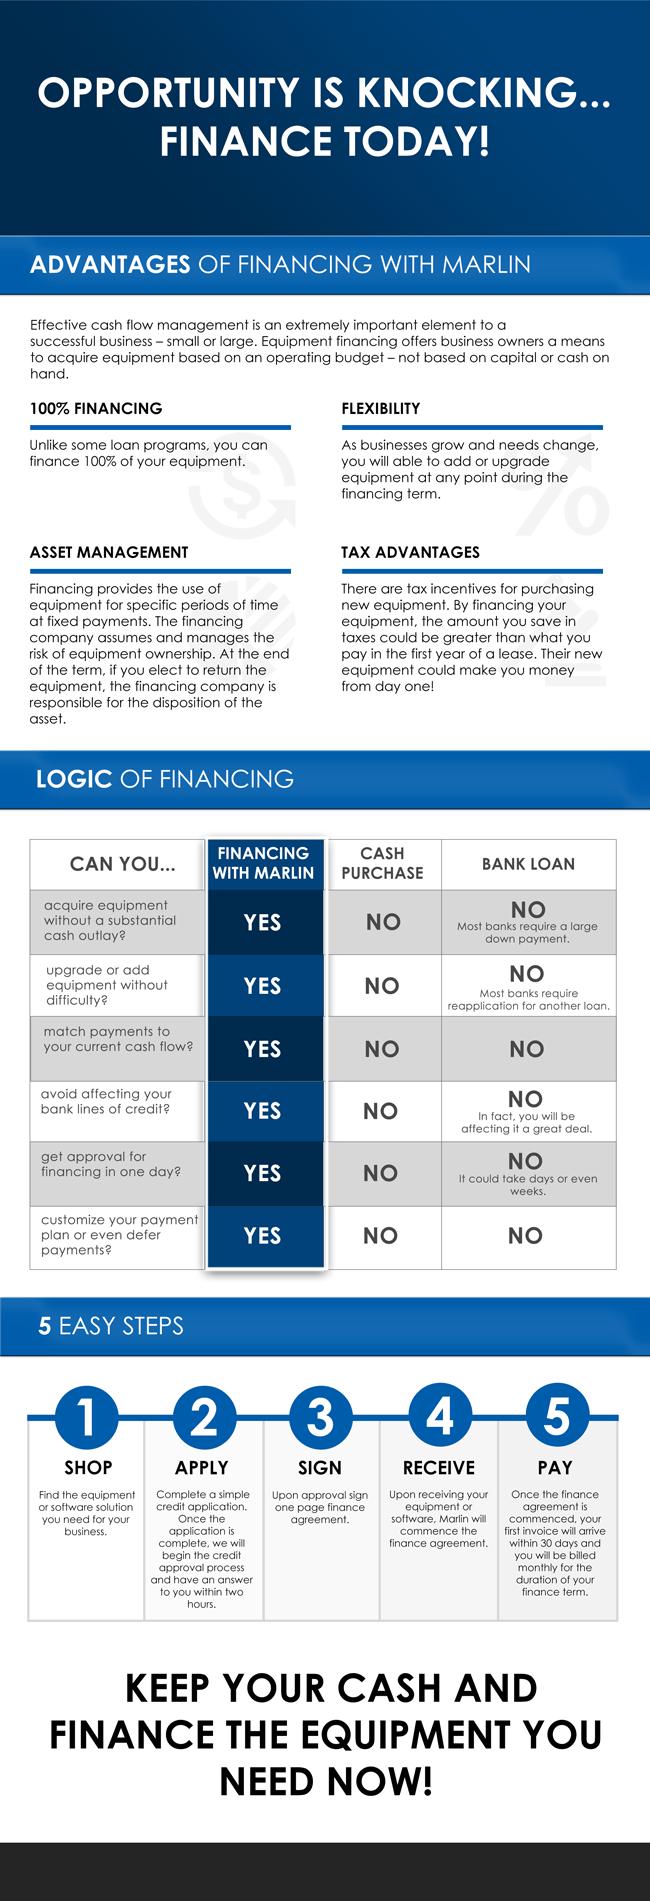 Laser Financing